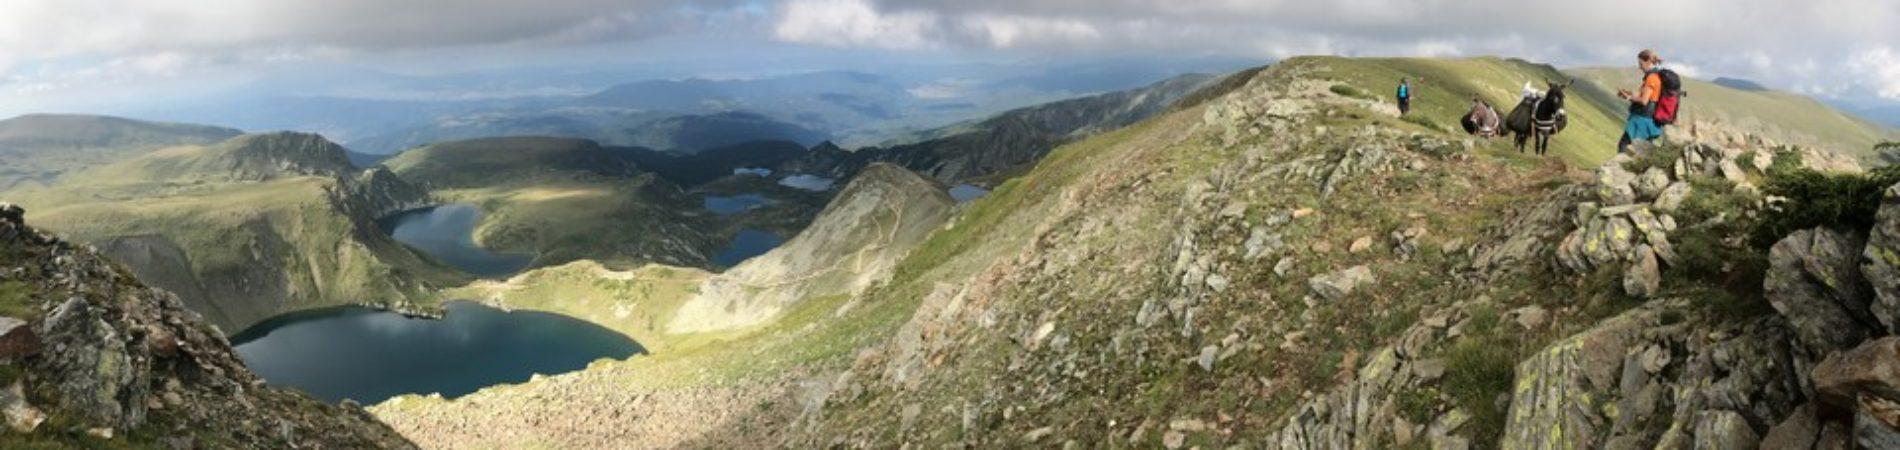 rila mountain in southwest bulgaria is the highest mountain on the balkan peninsula. Eselschrei Im Rila Gebirge Happy Donkeys